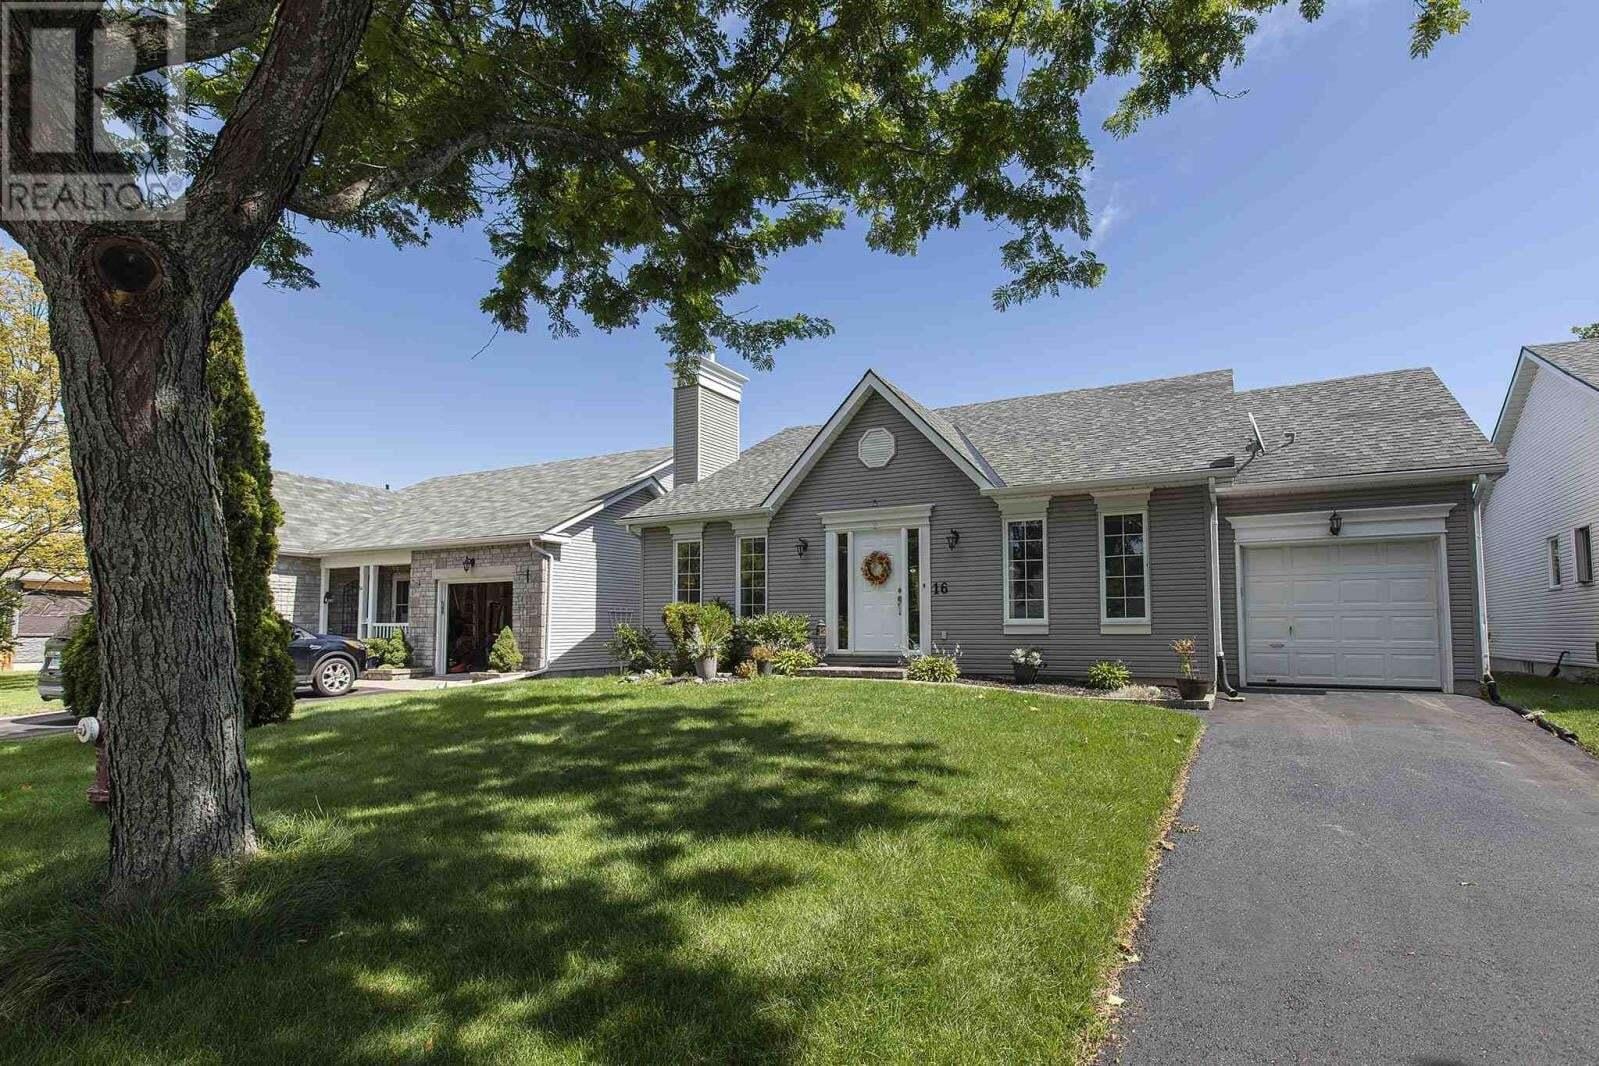 House for sale at 16 Abbey Dawn Dr Bath Ontario - MLS: K20005107